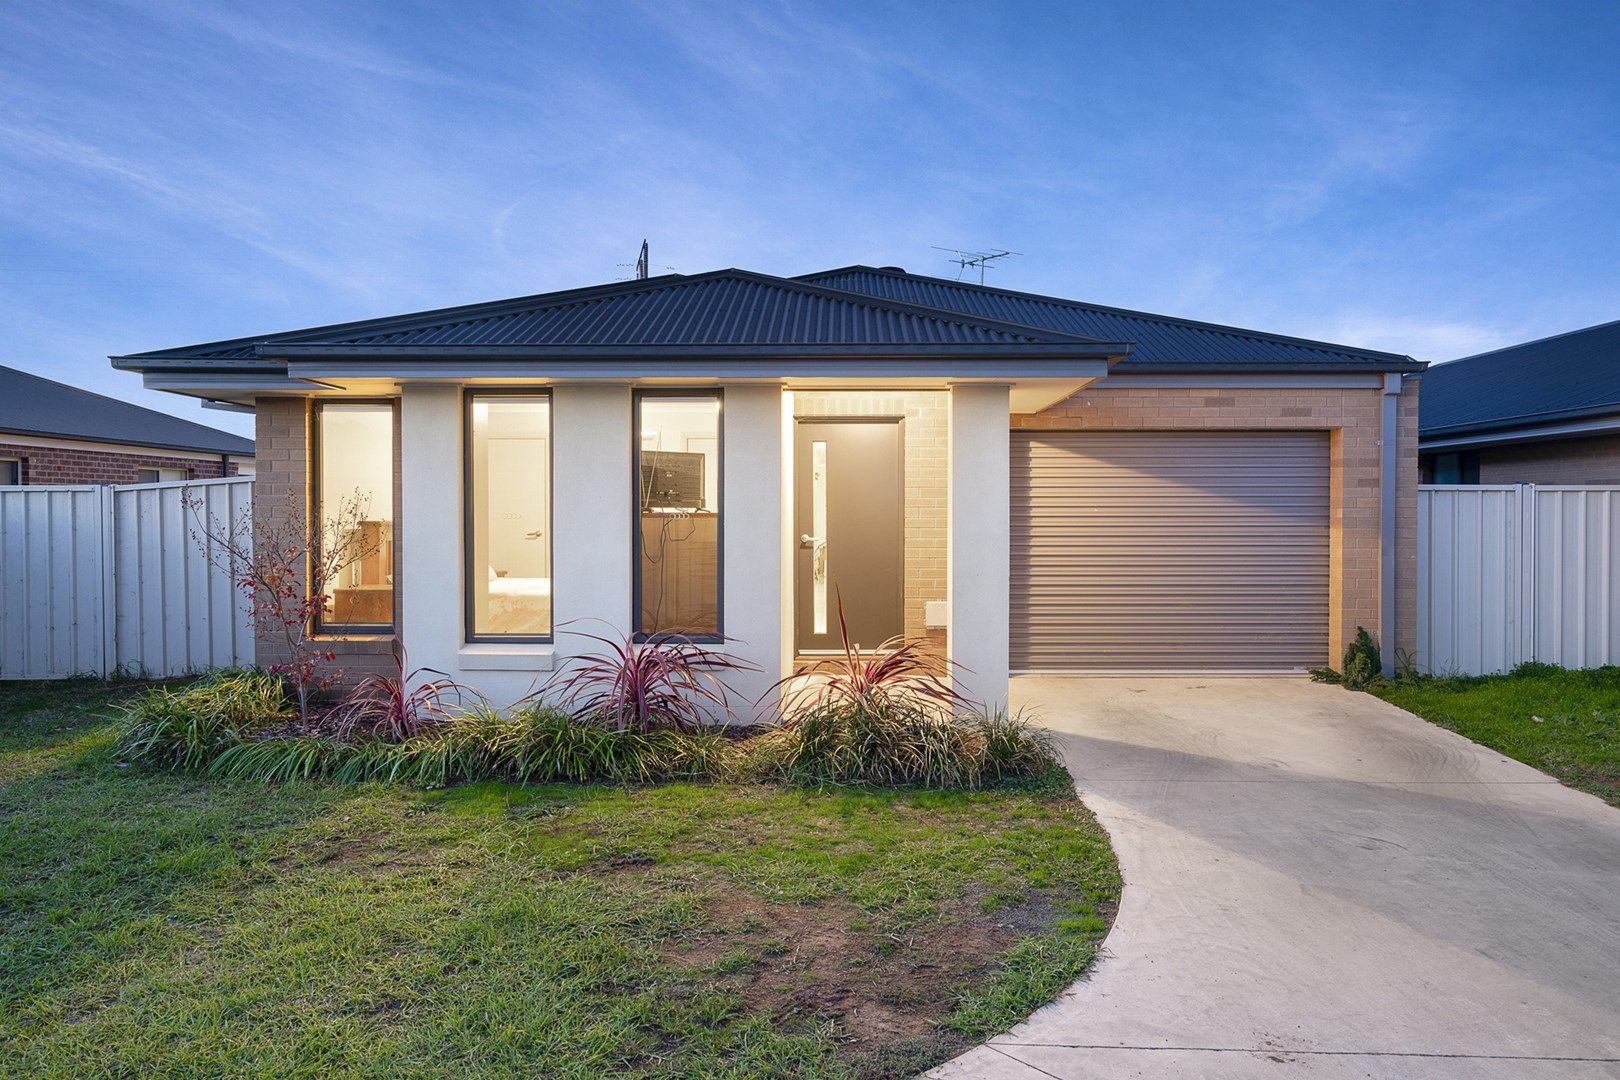 3/47 Hanrahan  Street, Lavington NSW 2641, Image 0